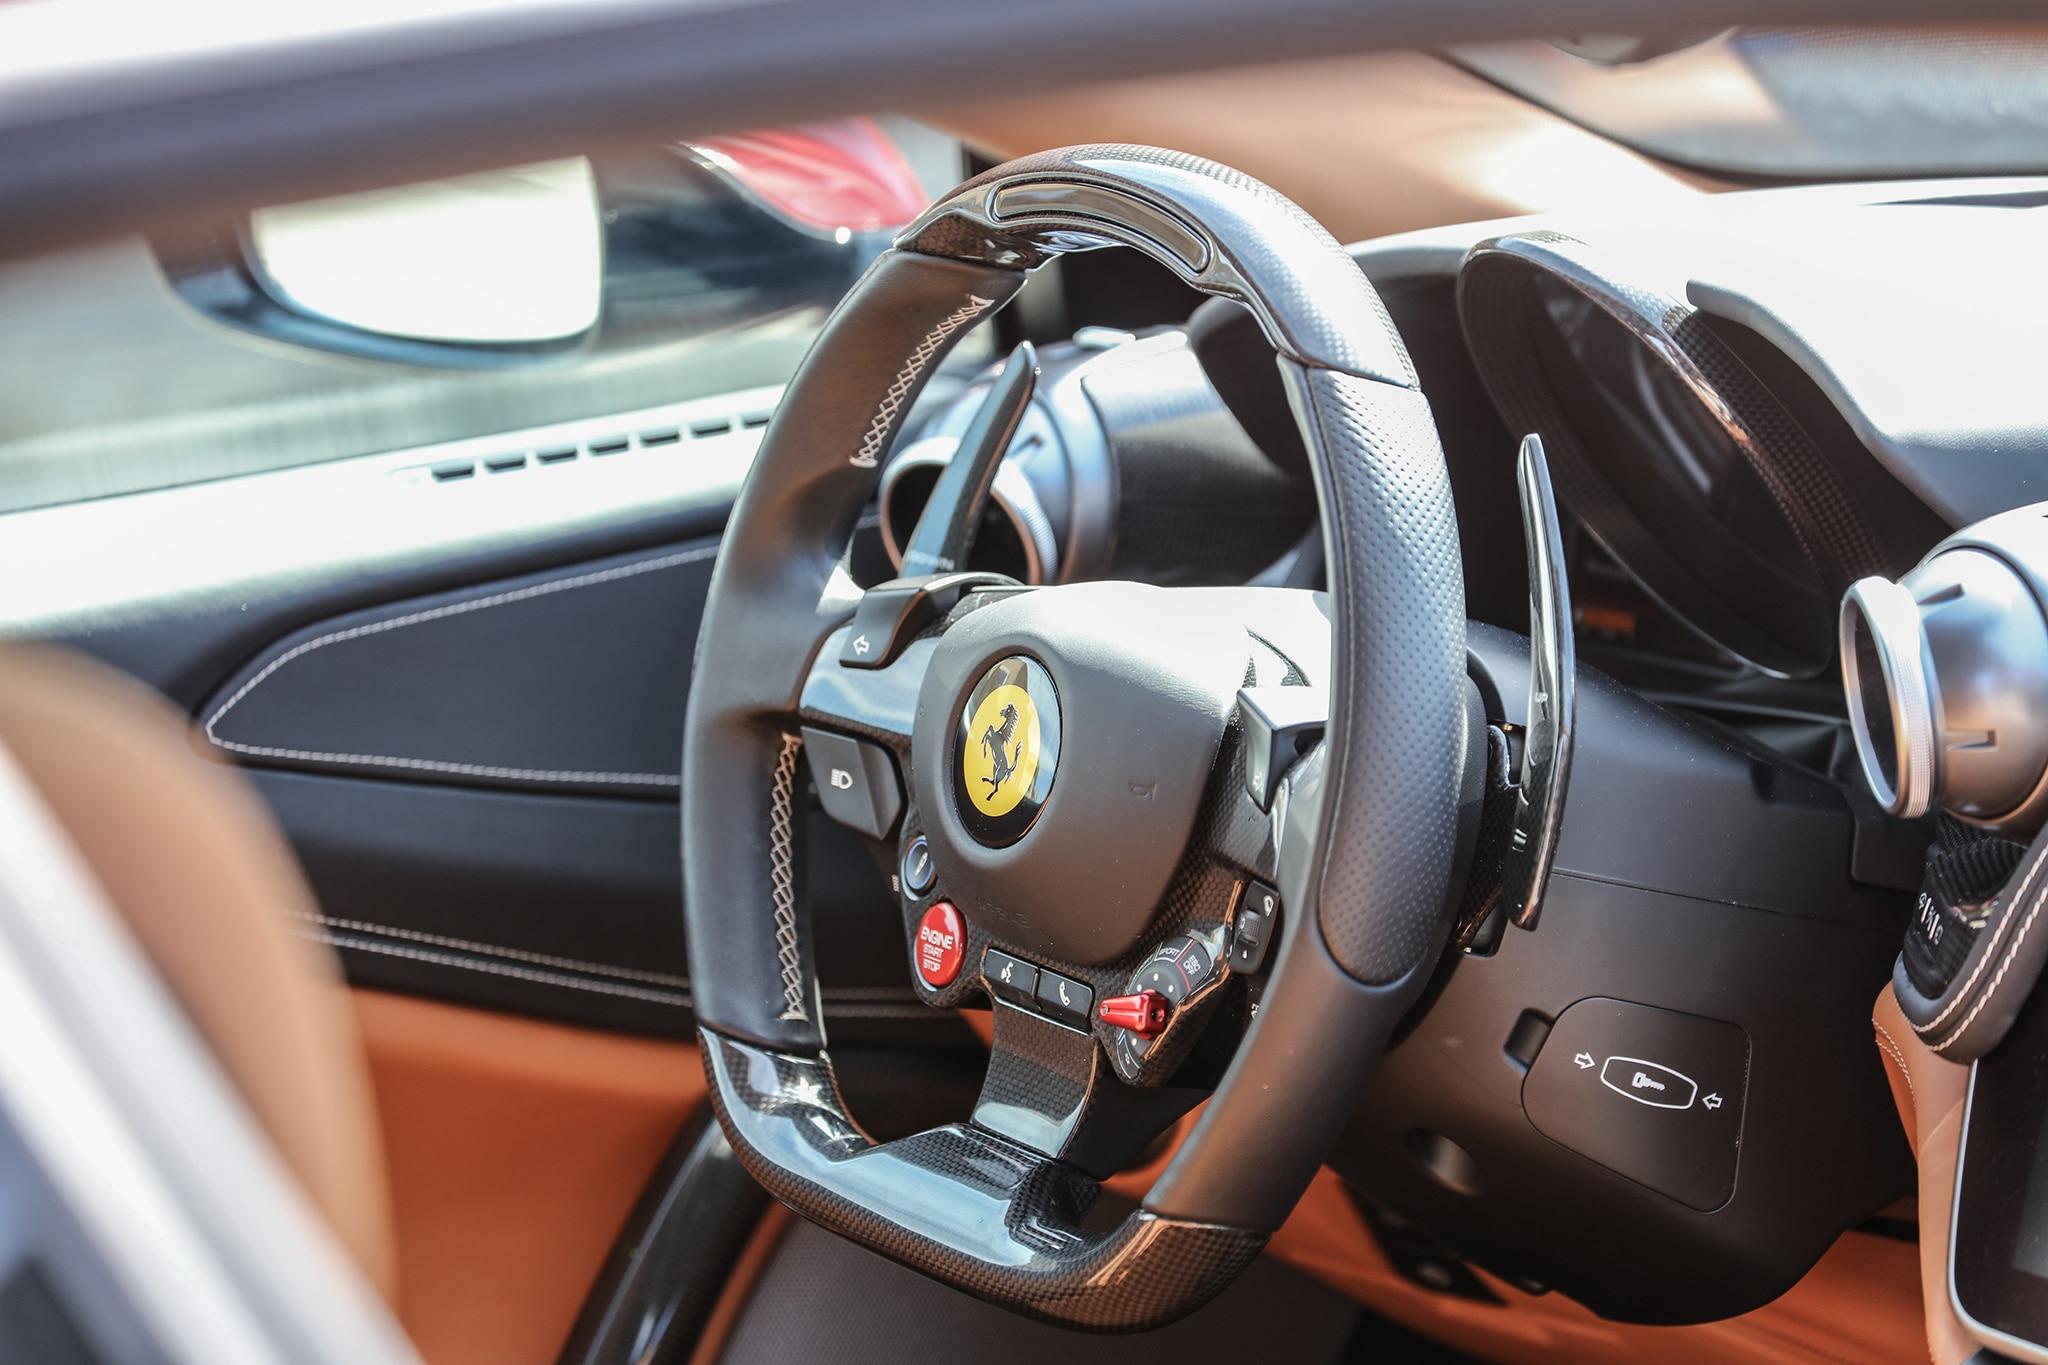 2018 ferrari 458. simple 2018 show more and 2018 ferrari 458